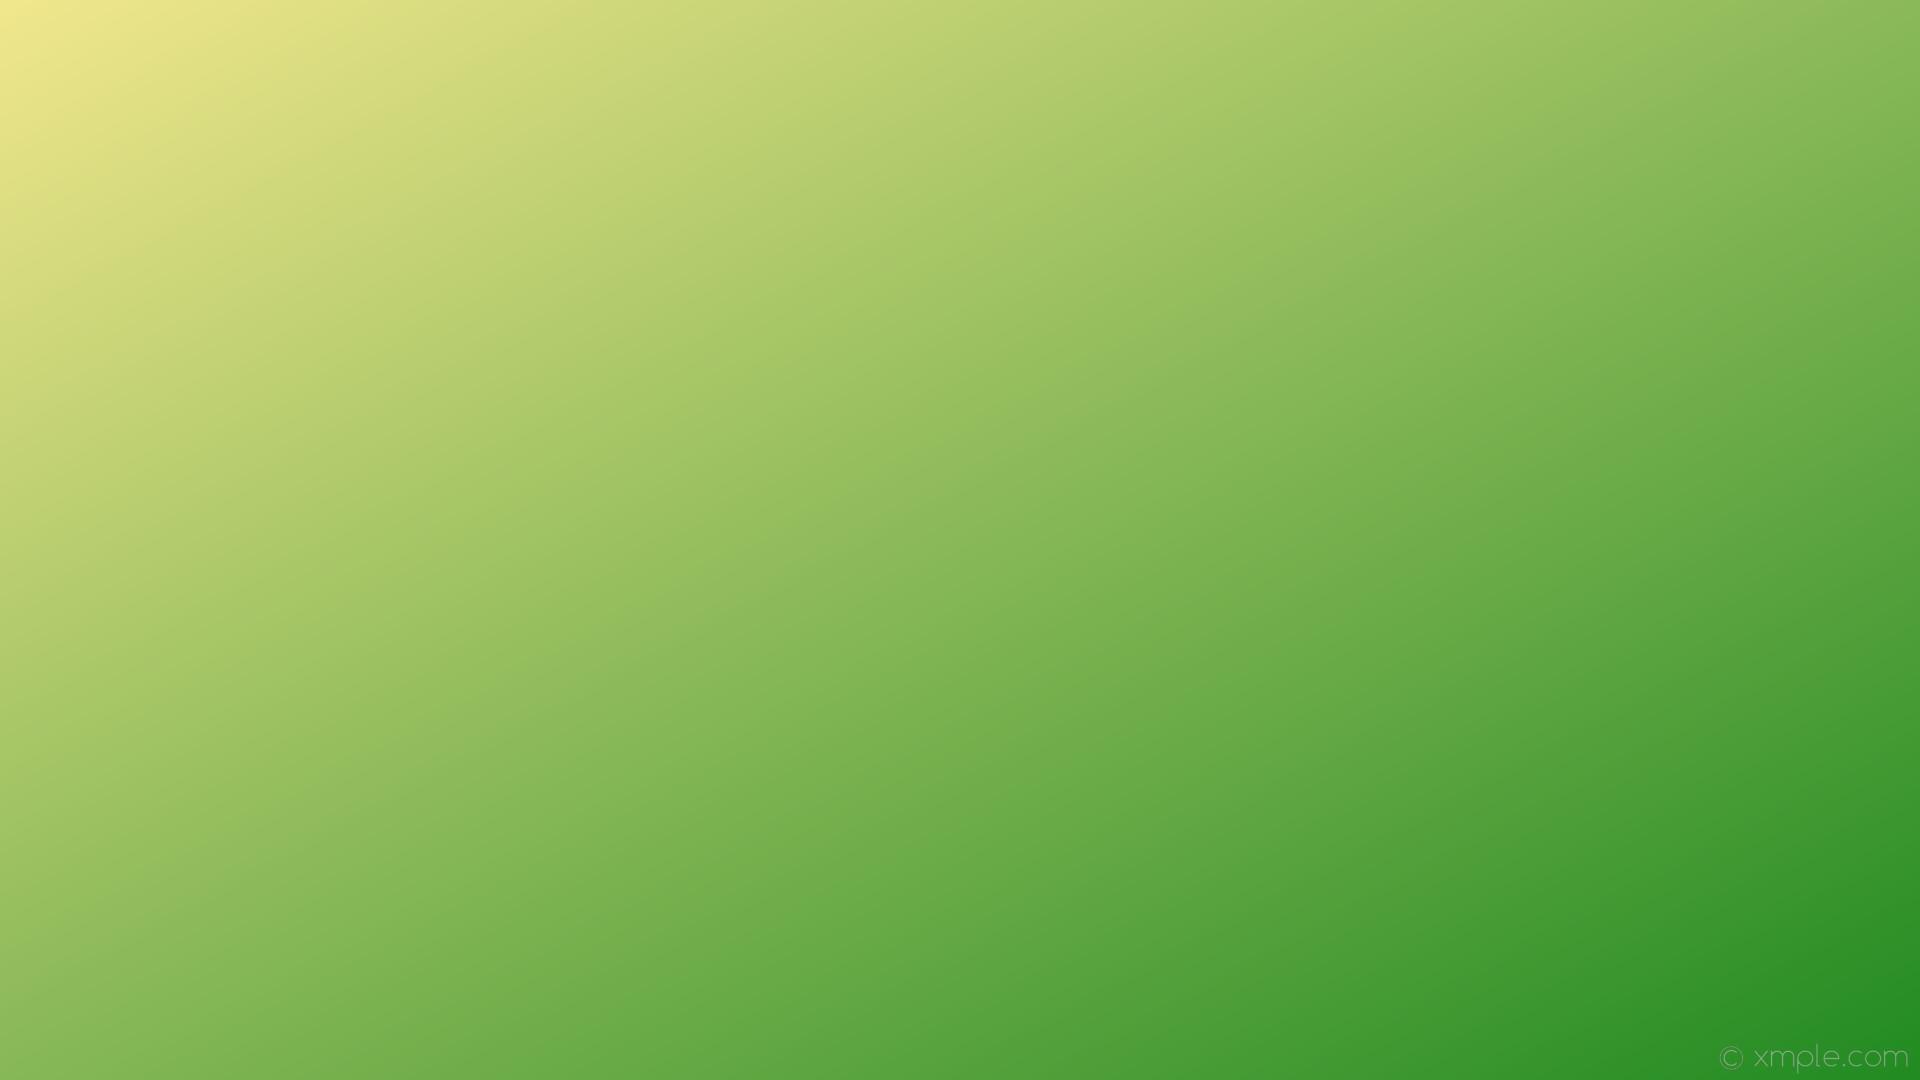 wallpaper linear green yellow gradient khaki forest green #f0e68c #228b22  150°